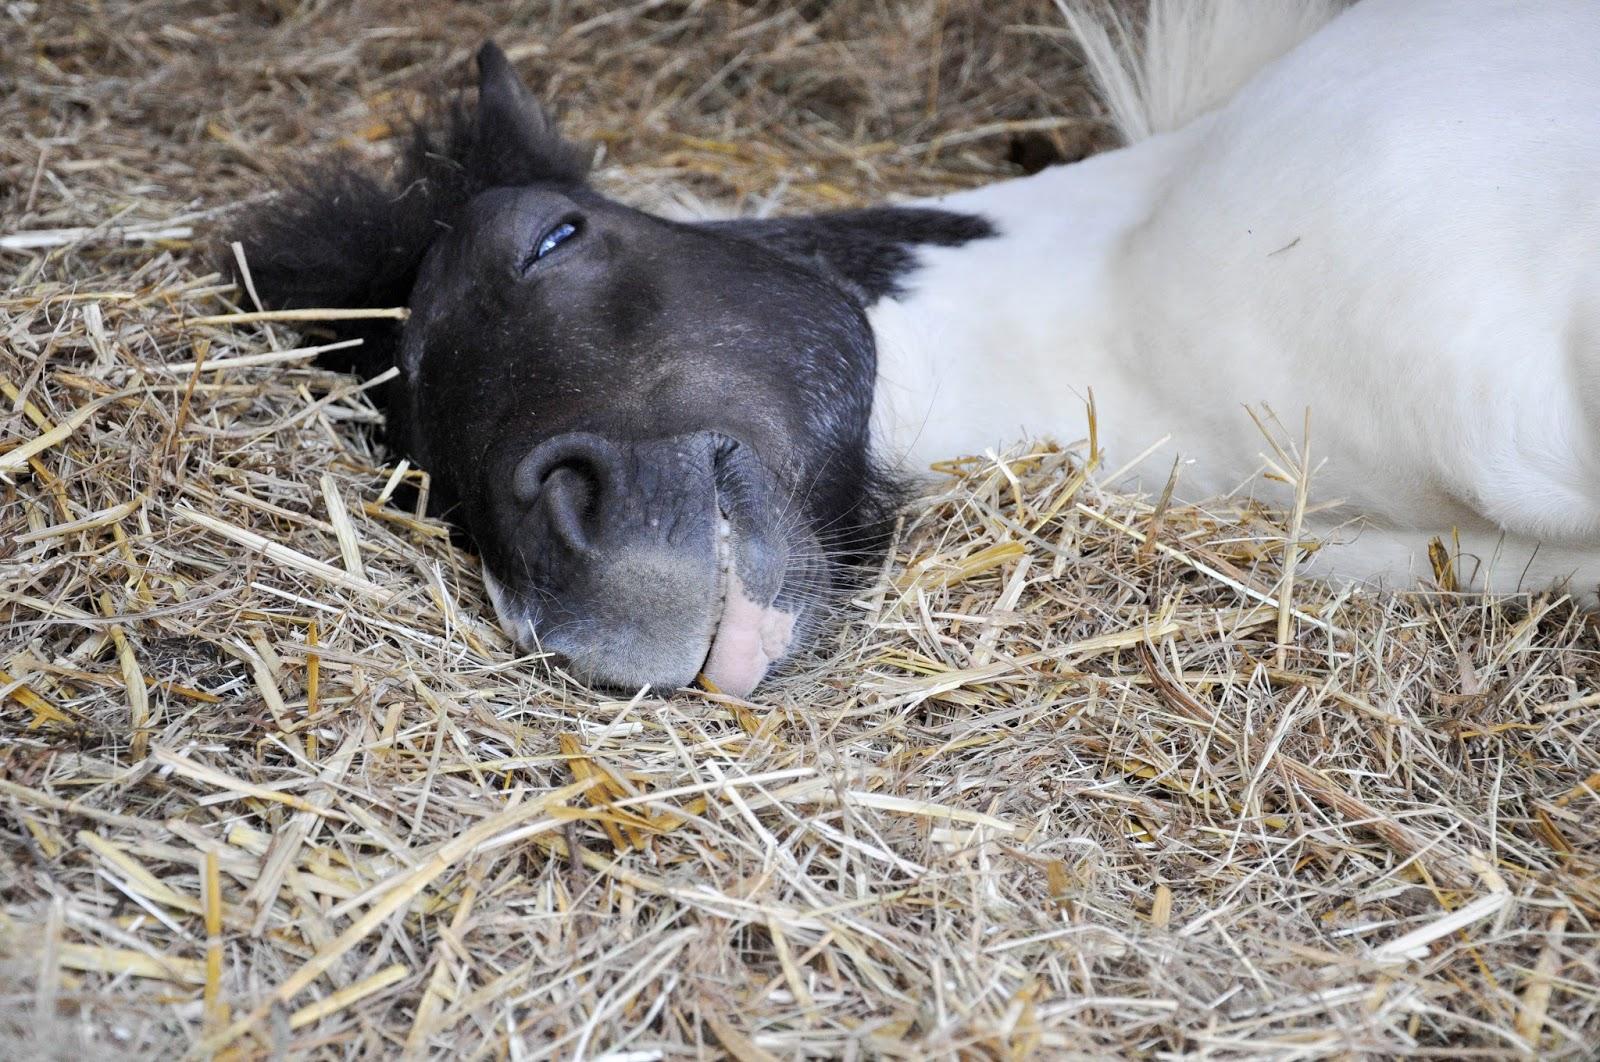 Tinker the Shetland Pony, The Garlic Farm, Isle of Wight, UK